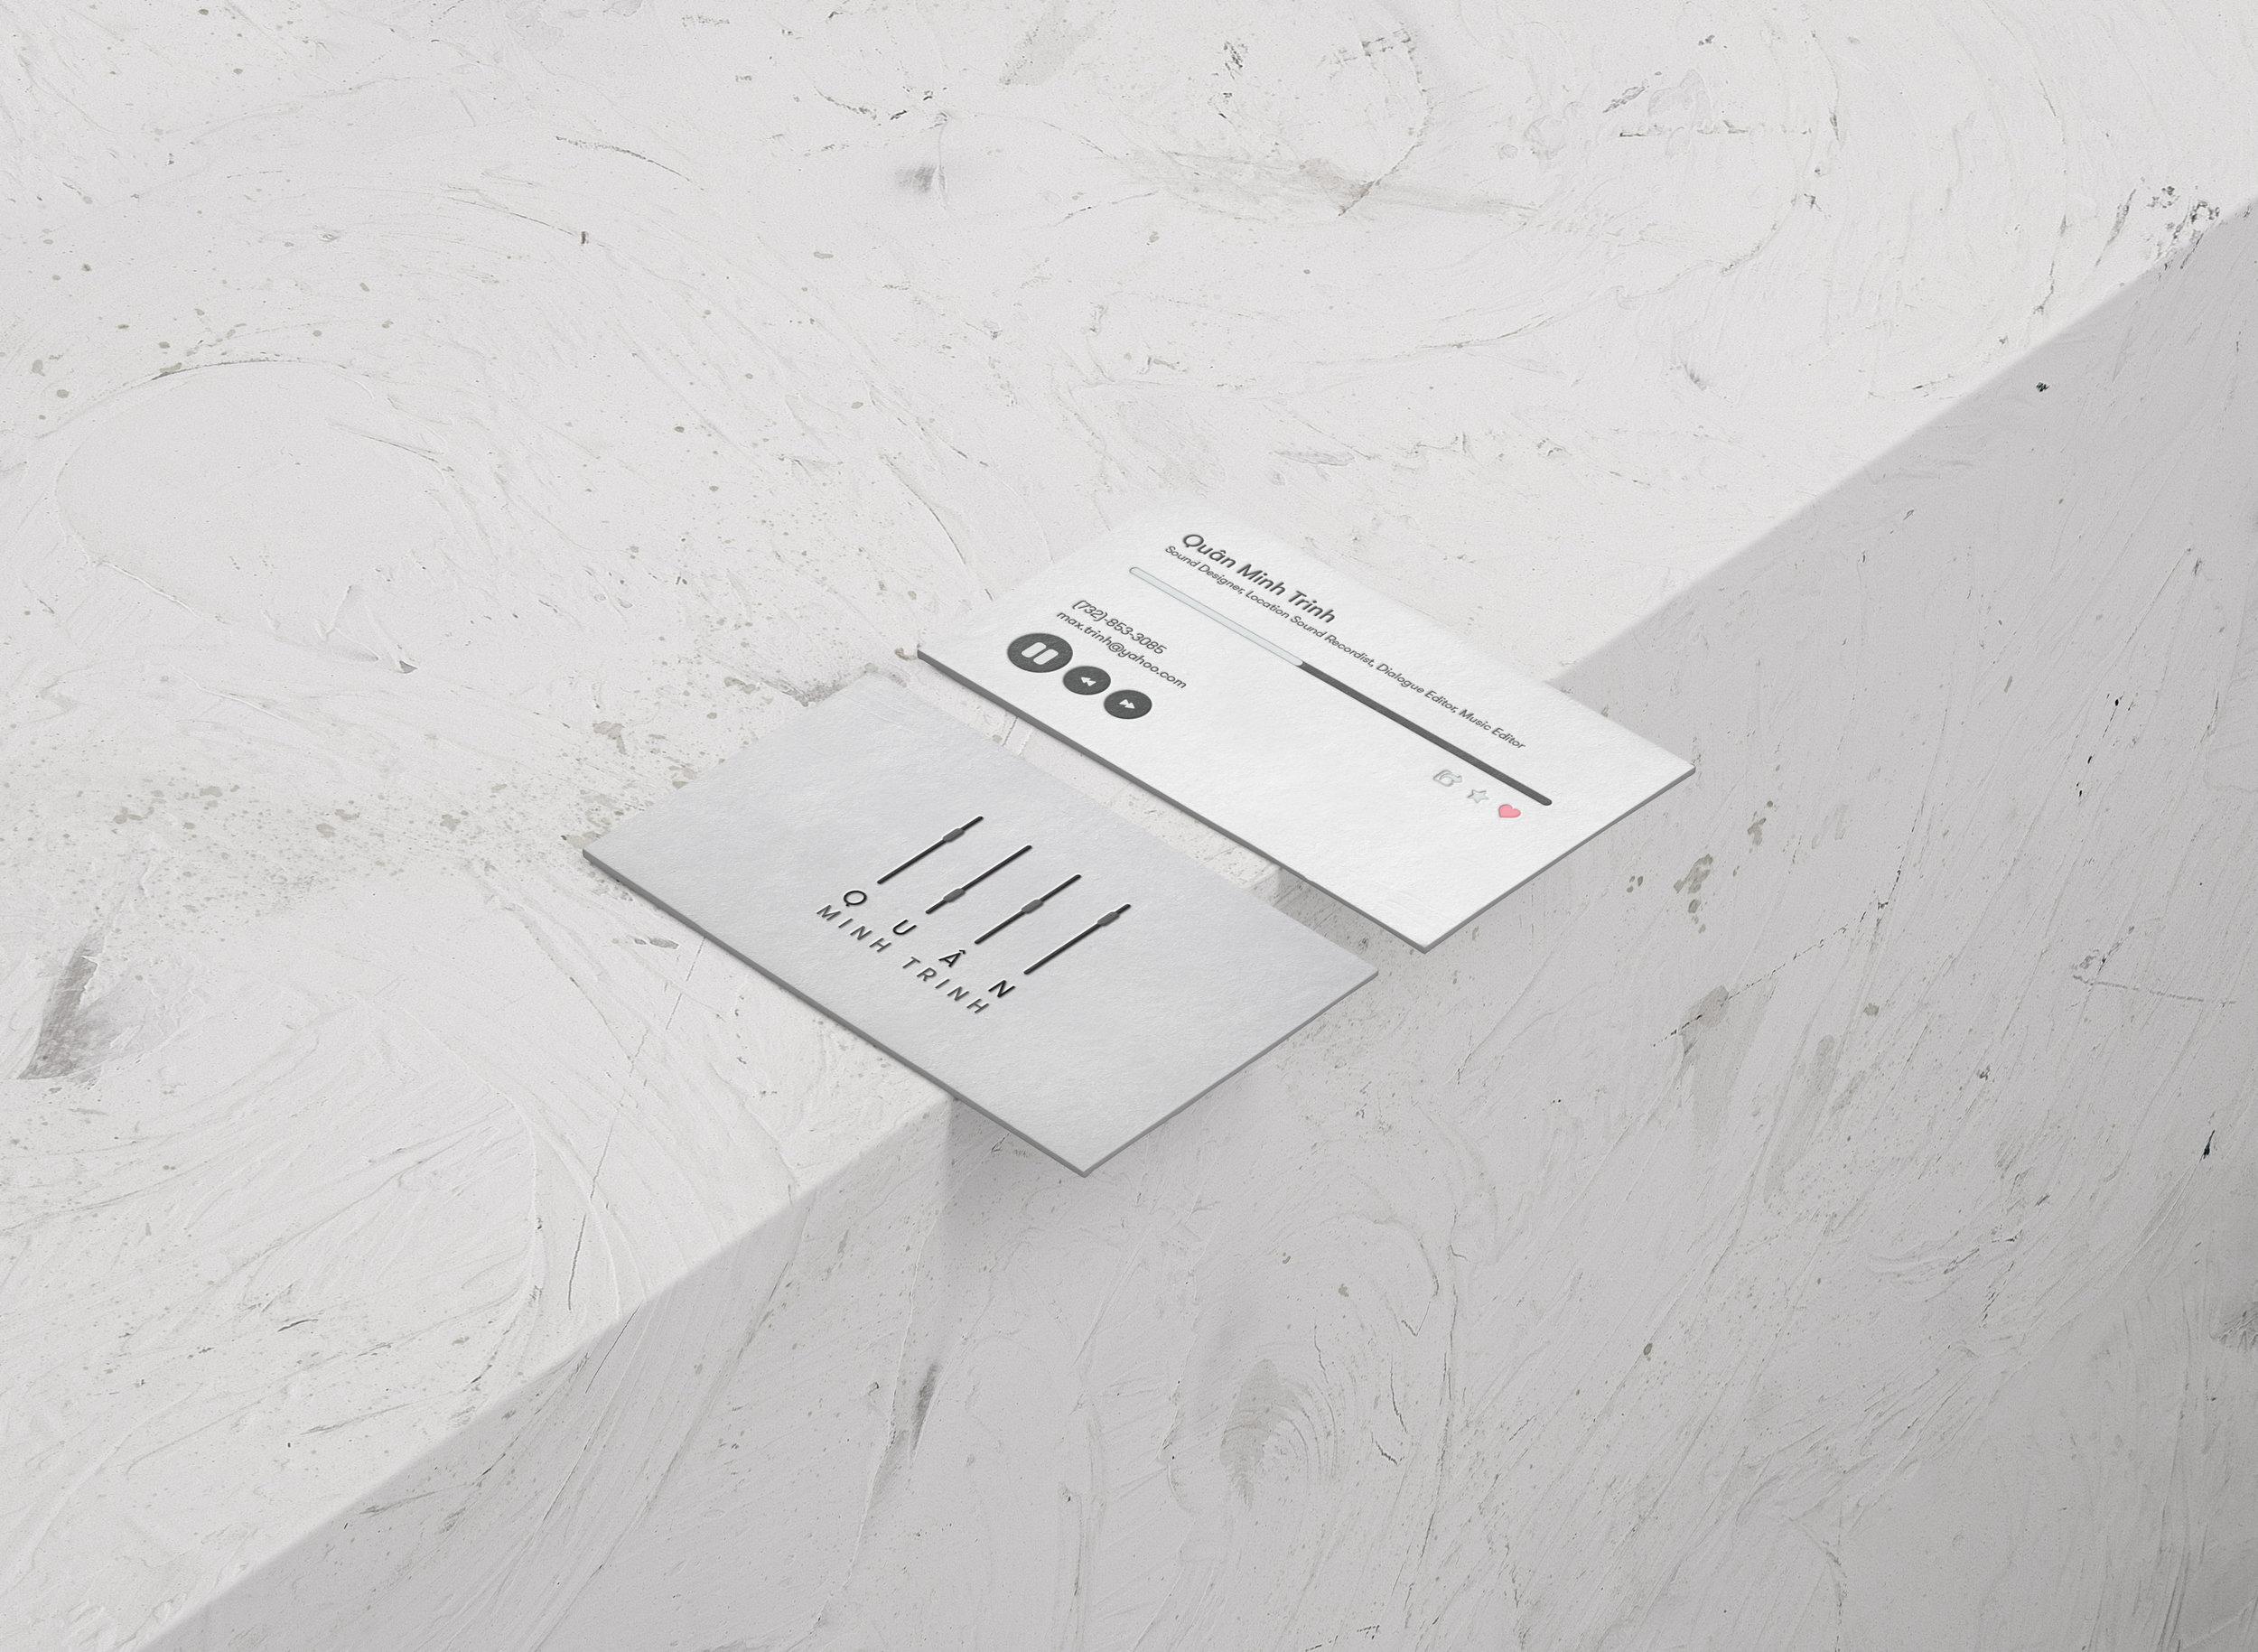 Businesscard-Mockup-presentation-vol-35.jpg